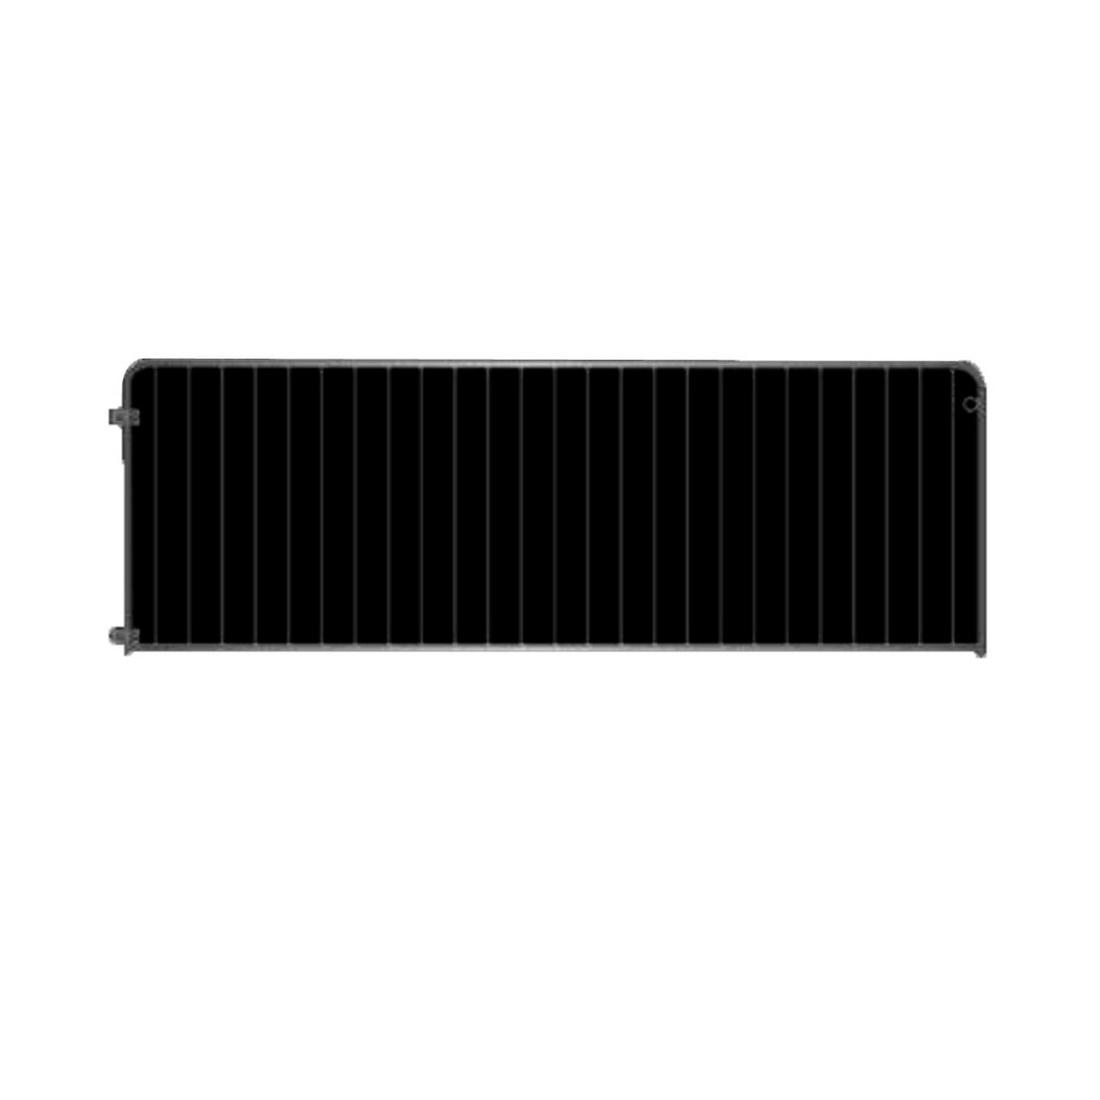 Tru-Test Vertical Barred Gate 1.07 x 1m Hot Dip Galvanised Steel 806587